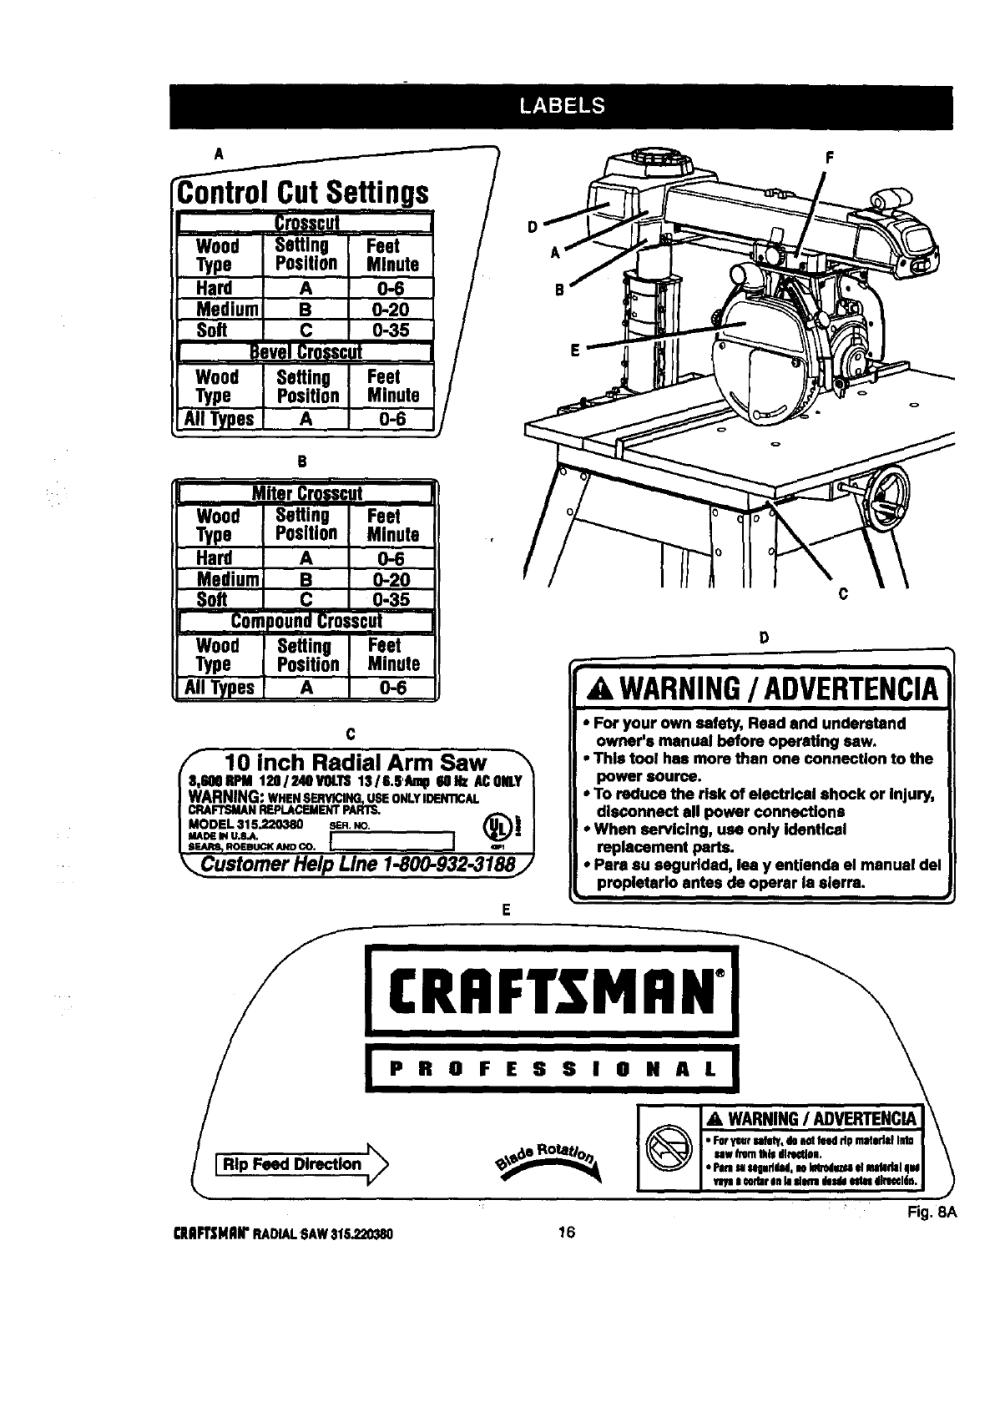 medium resolution of craftsman radial arm saw wiring diagram free picture wiring library rh 99 mac happen de craftsman